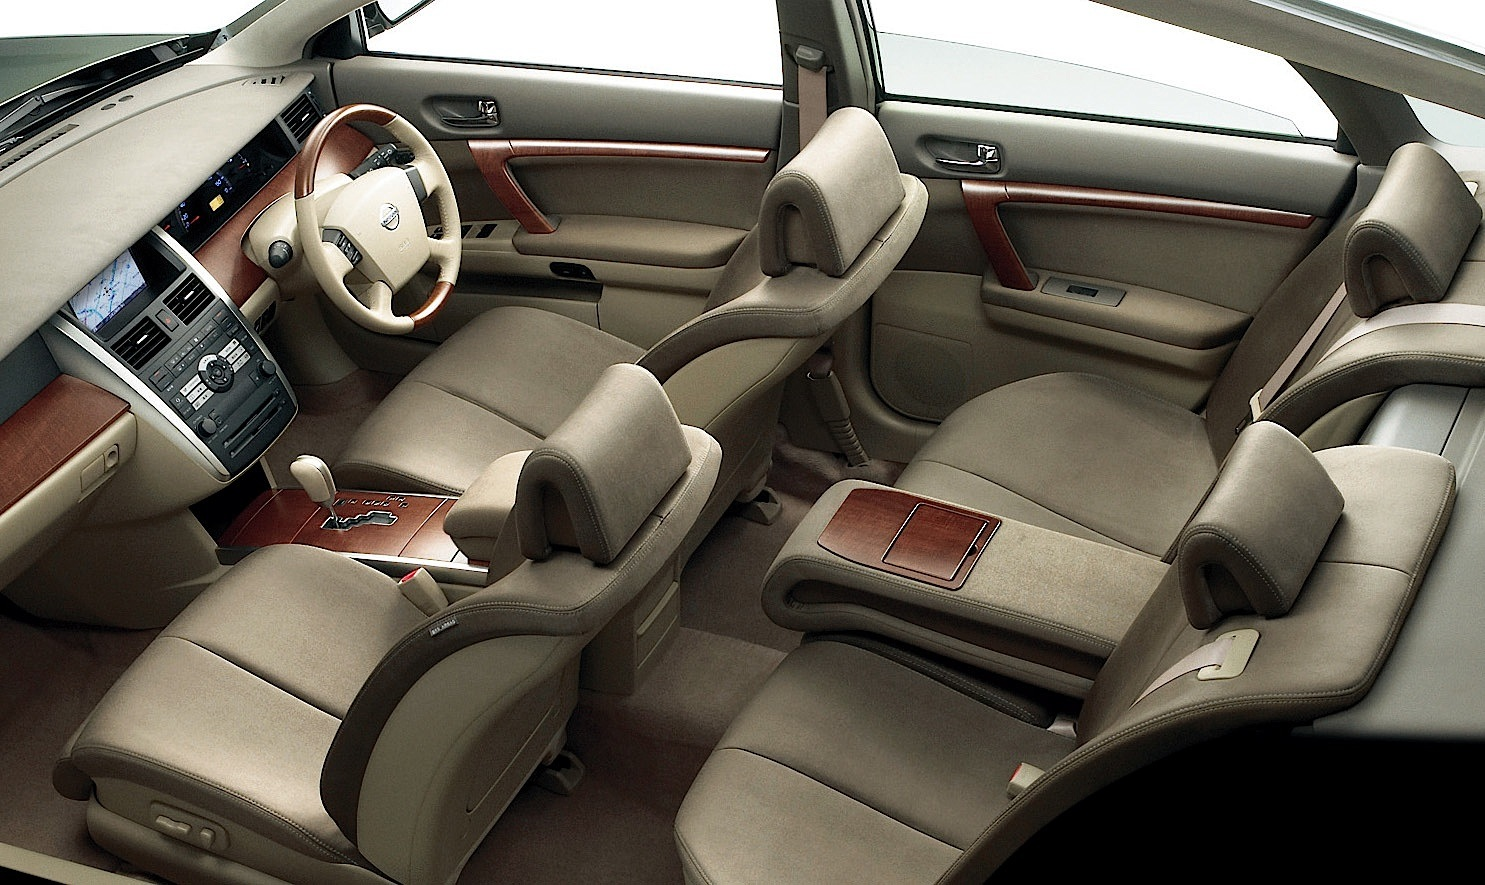 Nissan Teana I Restyling 2006 - 2008 Sedan #7